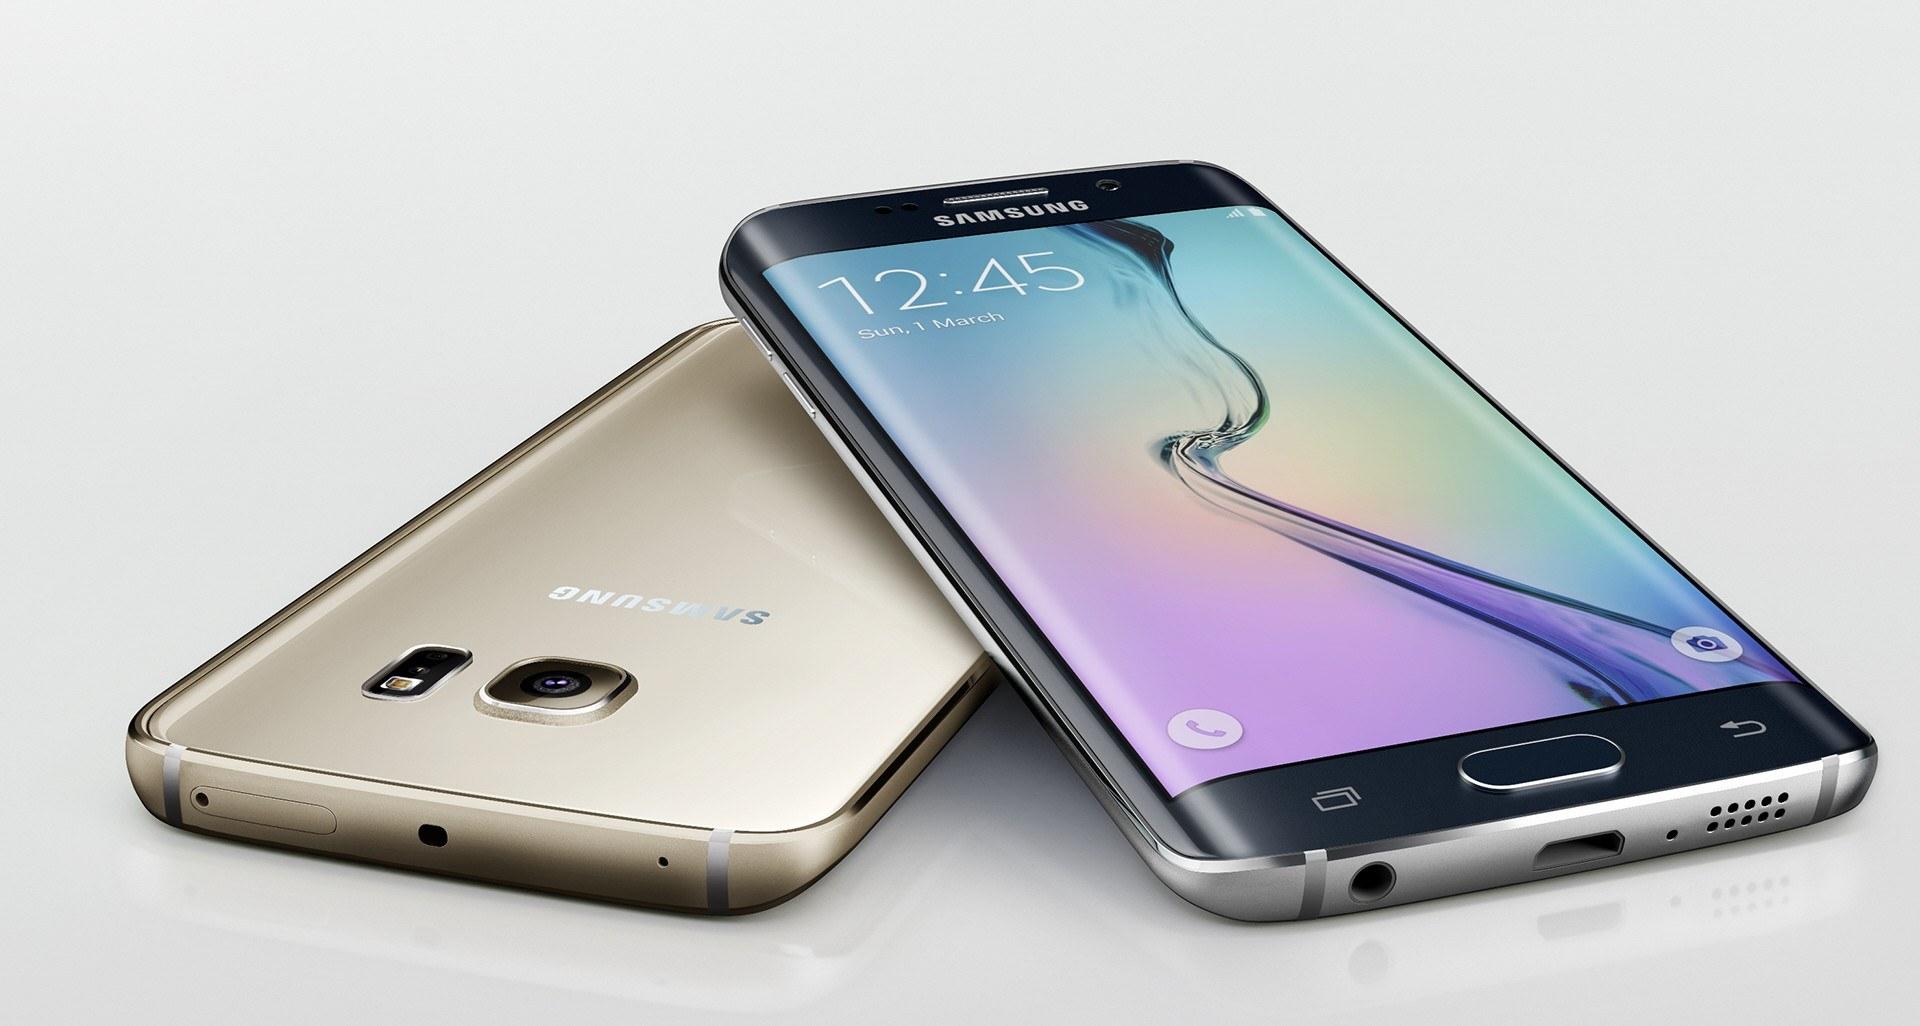 Moto Z vs Samsung Galaxy S7 vs LG G5 vs Huawei P9